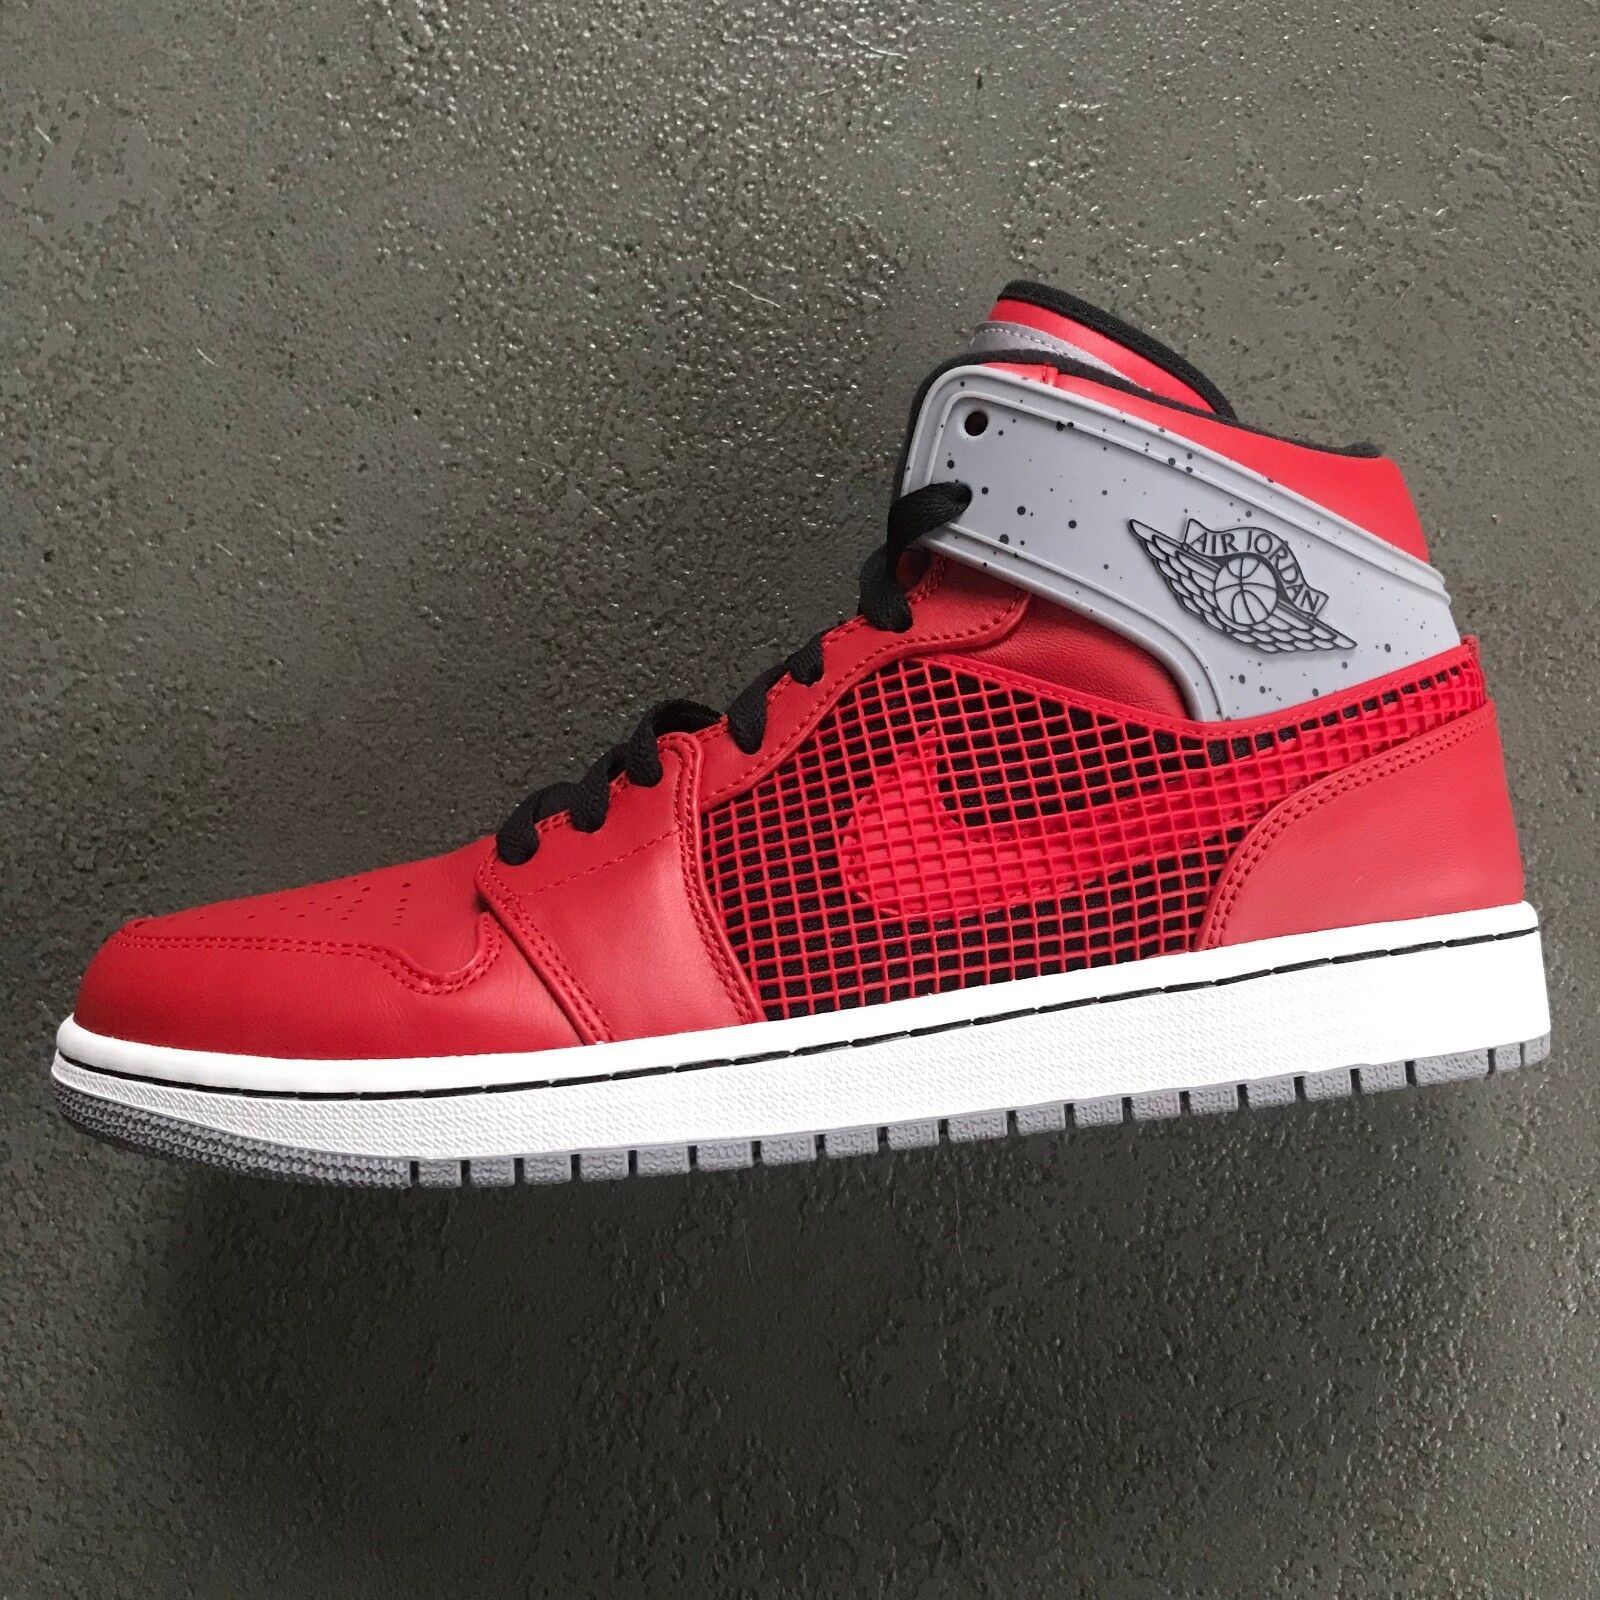 Nike Air Jordan 1 '89 Sz 10 VVNDS Fire Red Red Red Cement Retro 4 IV  599873-602 c3eb00